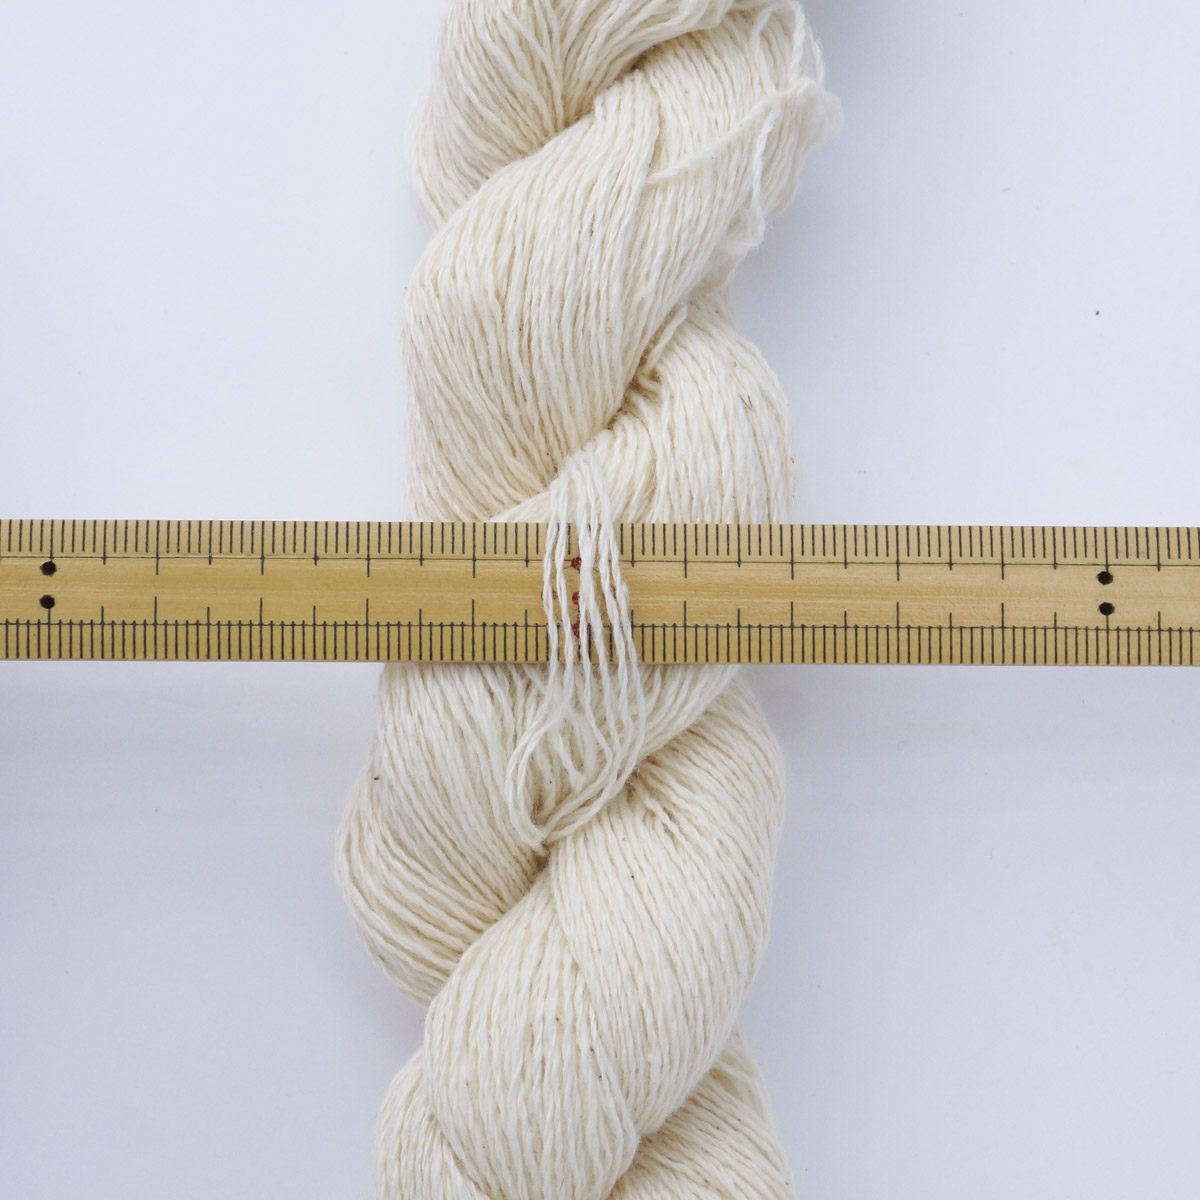 ガラ紡糸 317/2細番手糸 生成 20g